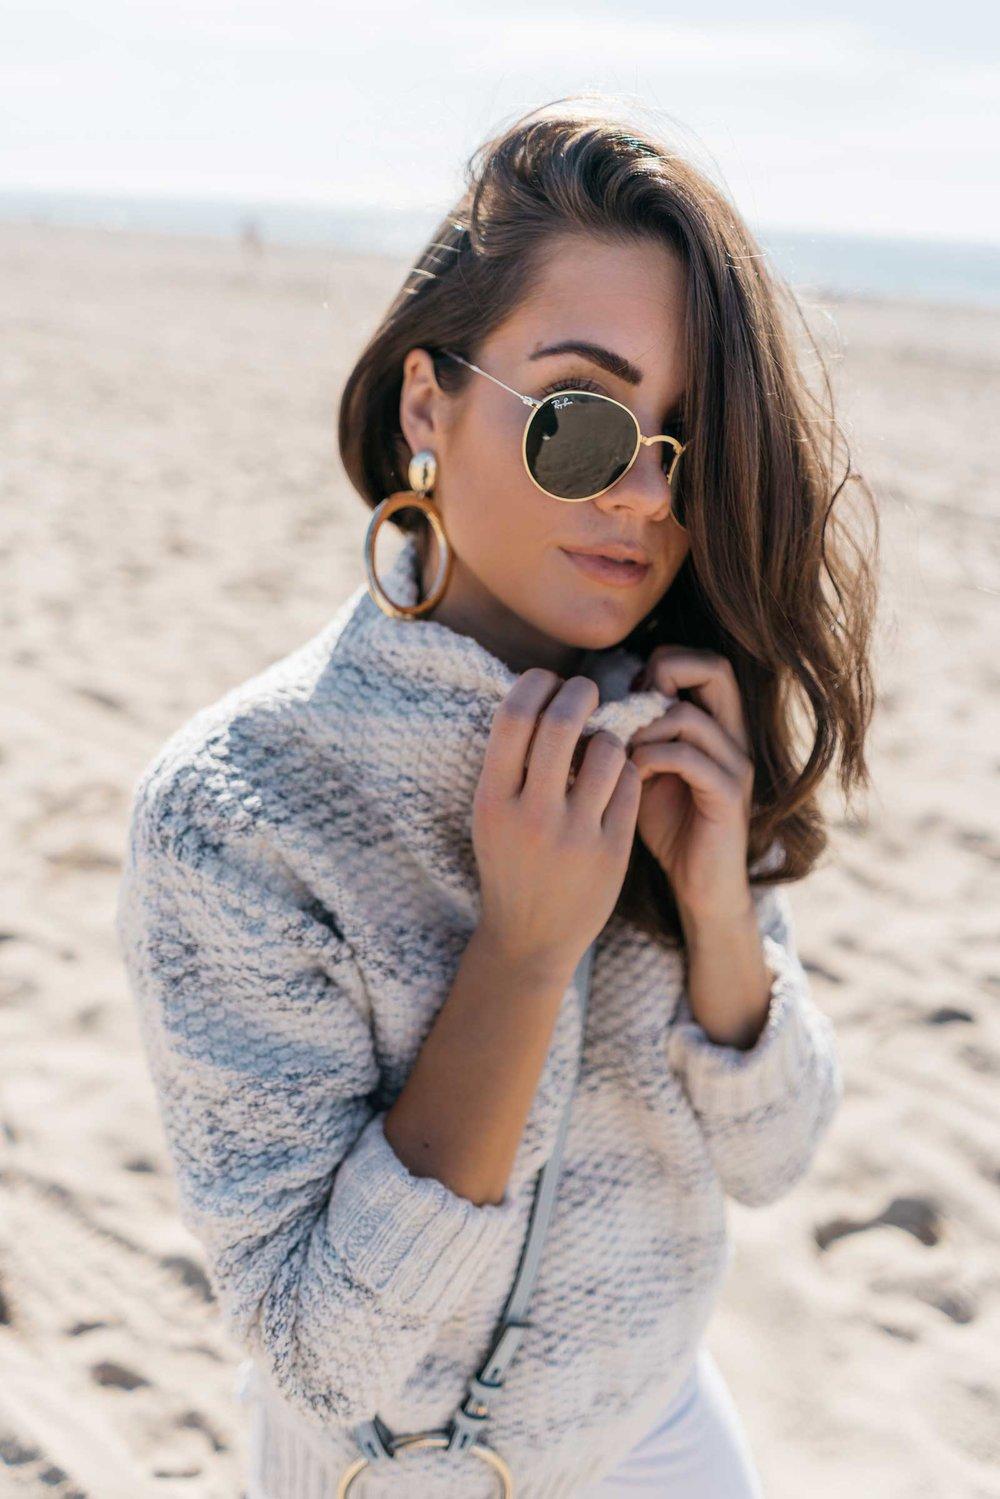 O'Neill-Livie-Striped-Mock-Neck-Sweater-Chloe-Faye-Small-Leather-Bracelet-Bag-Ray-Ban-53mm-Retro-Sunglasses-9.jpg